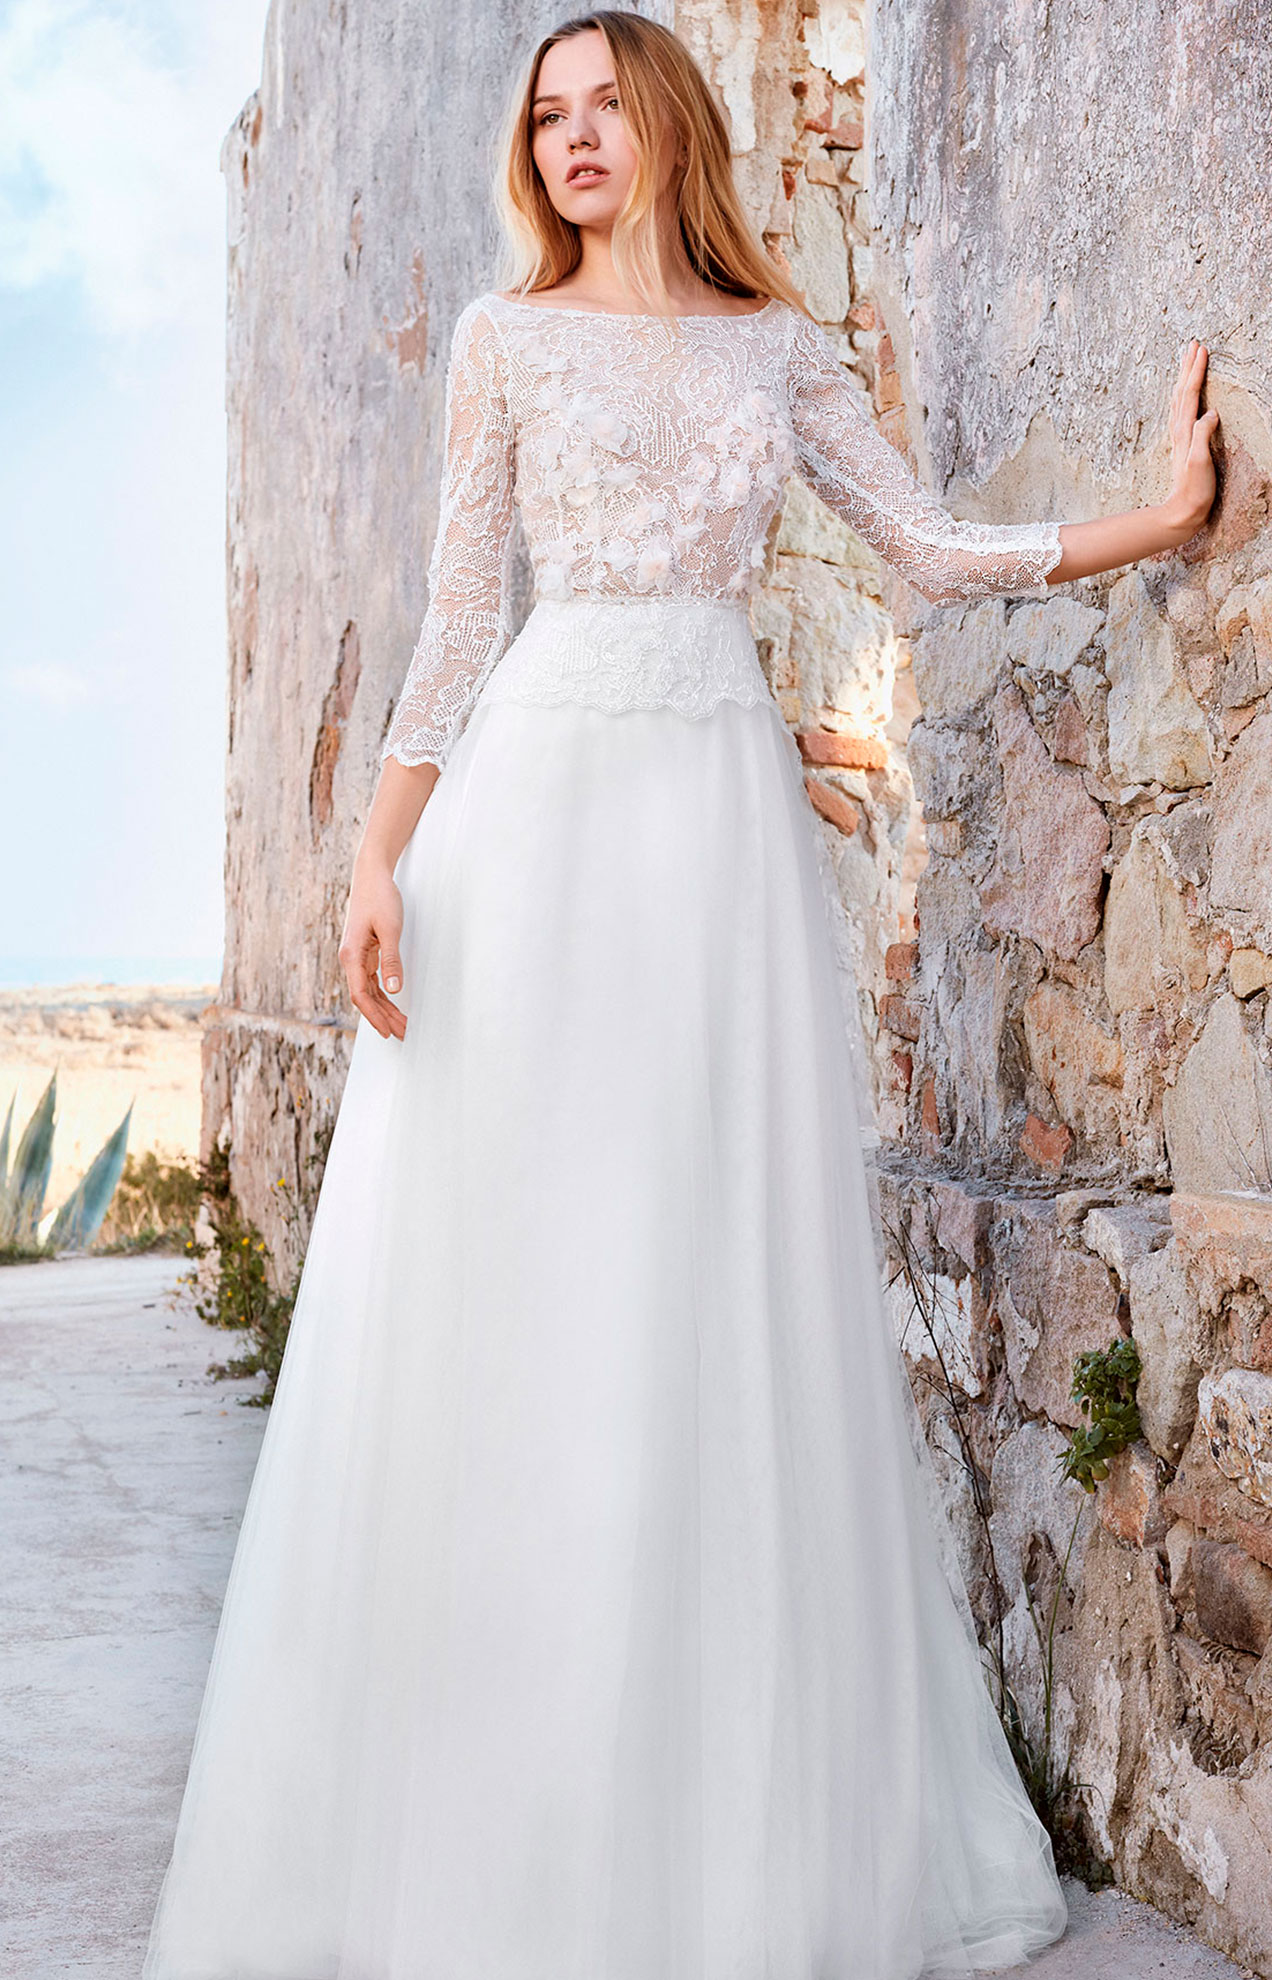 Vestidos fiesta novia valencia